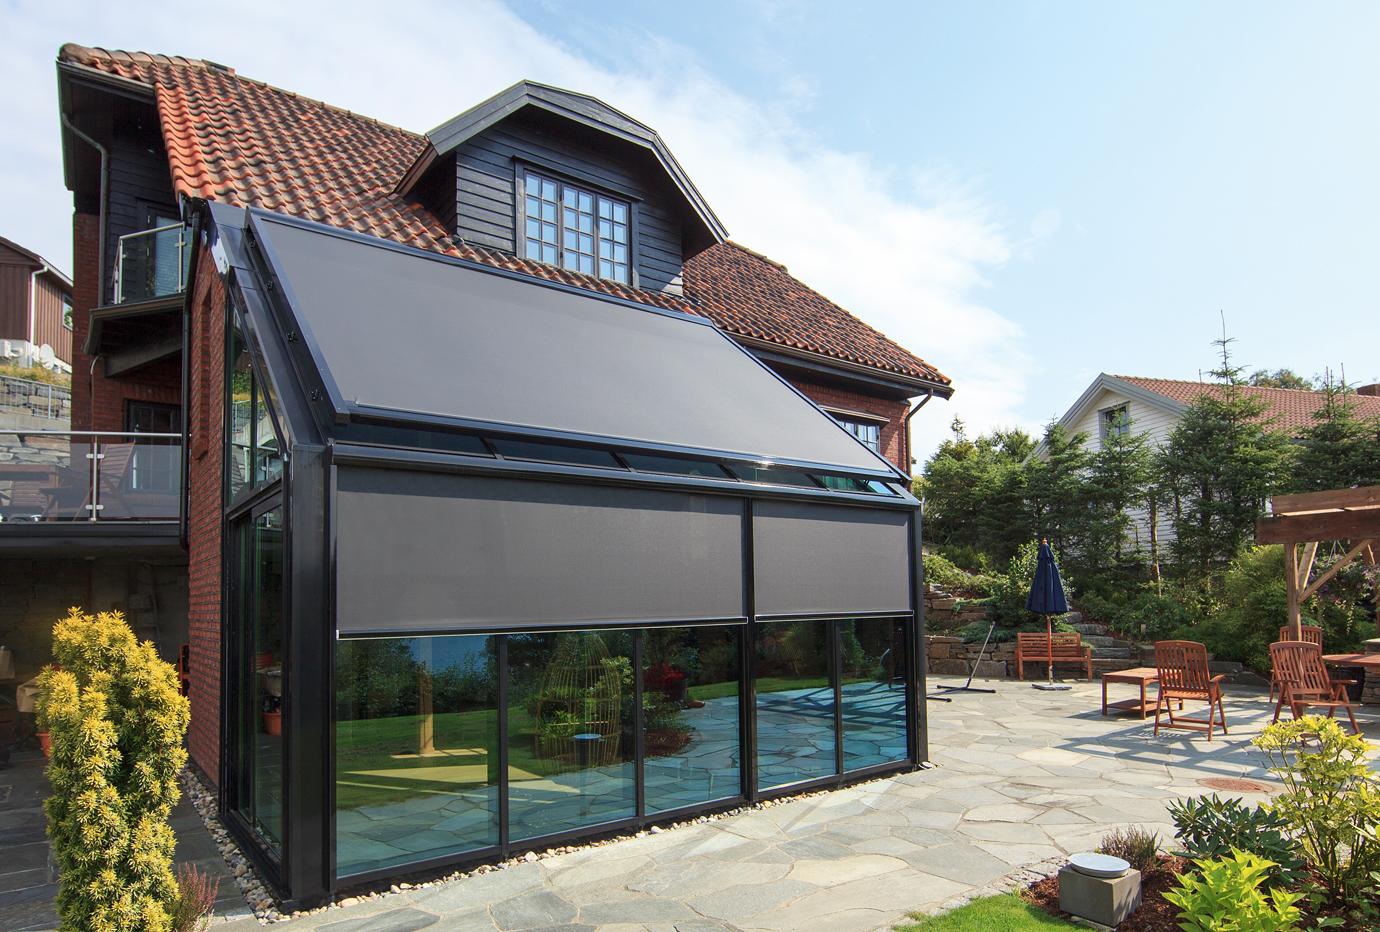 TopFixMax_Roof-blinds_6.jpg